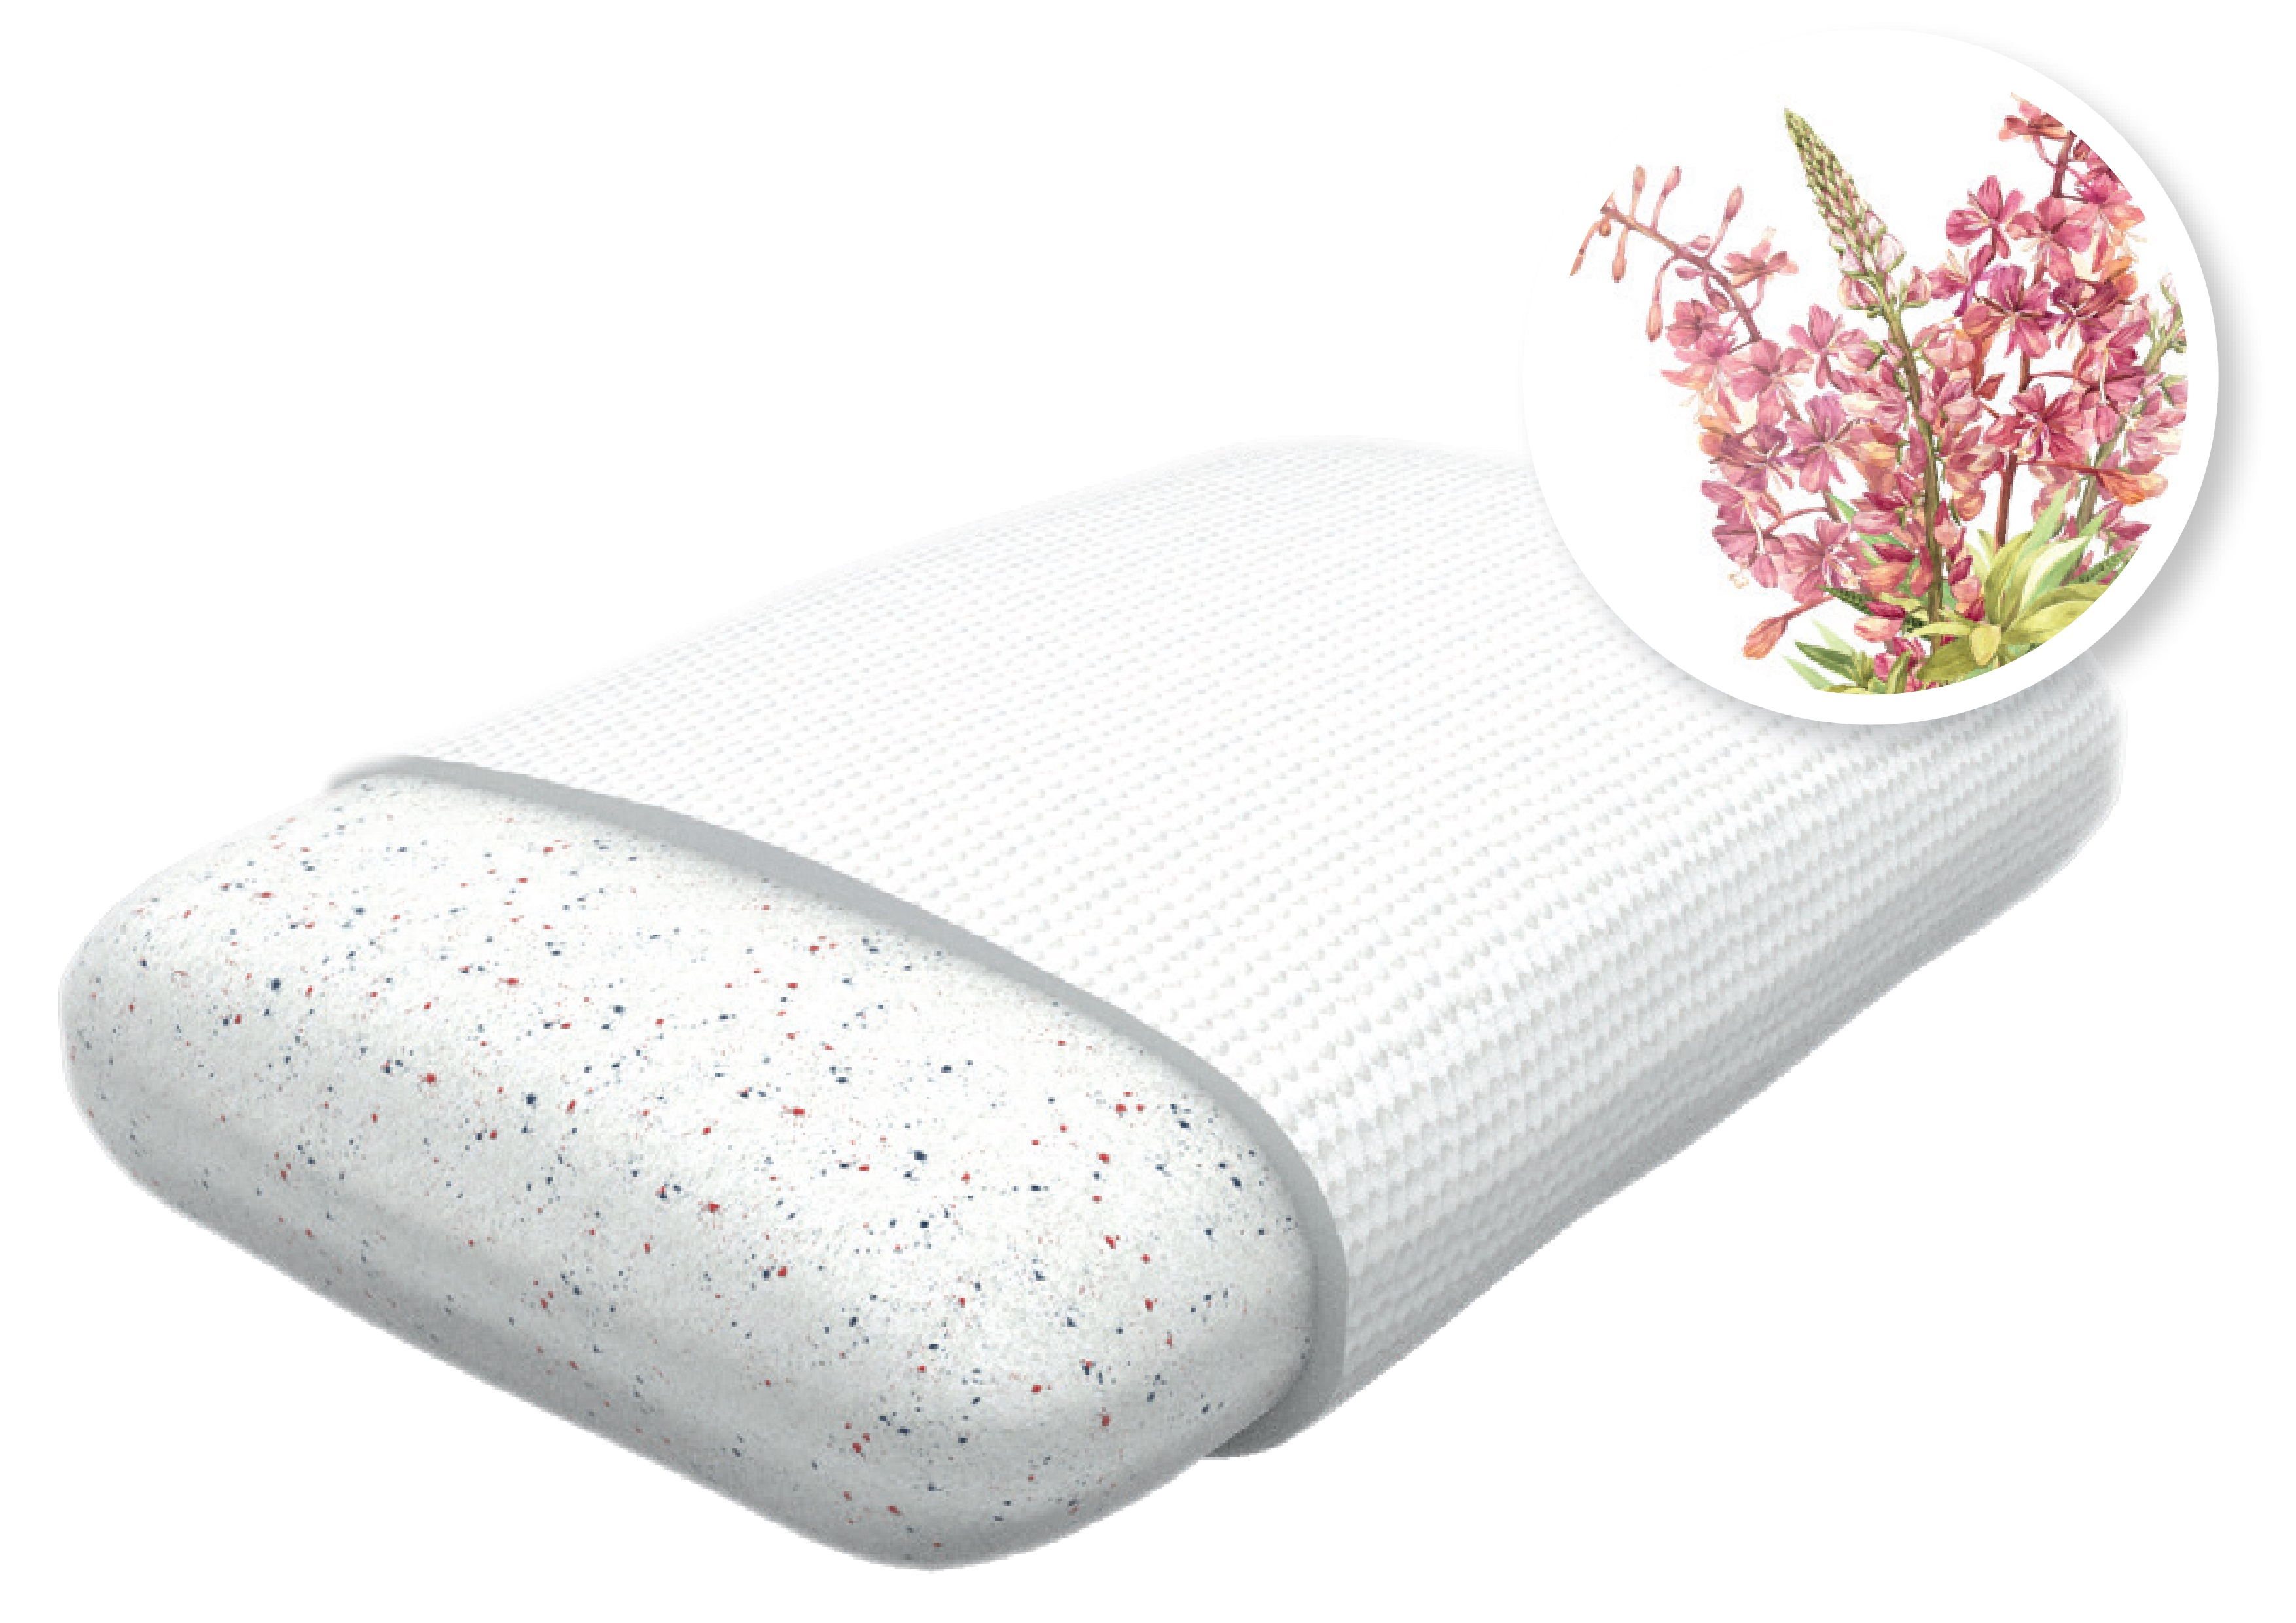 Подушки Revery Подушка Eternal Beauty (M) подушки fabe высокая подушка с памятью формы memo classic 16